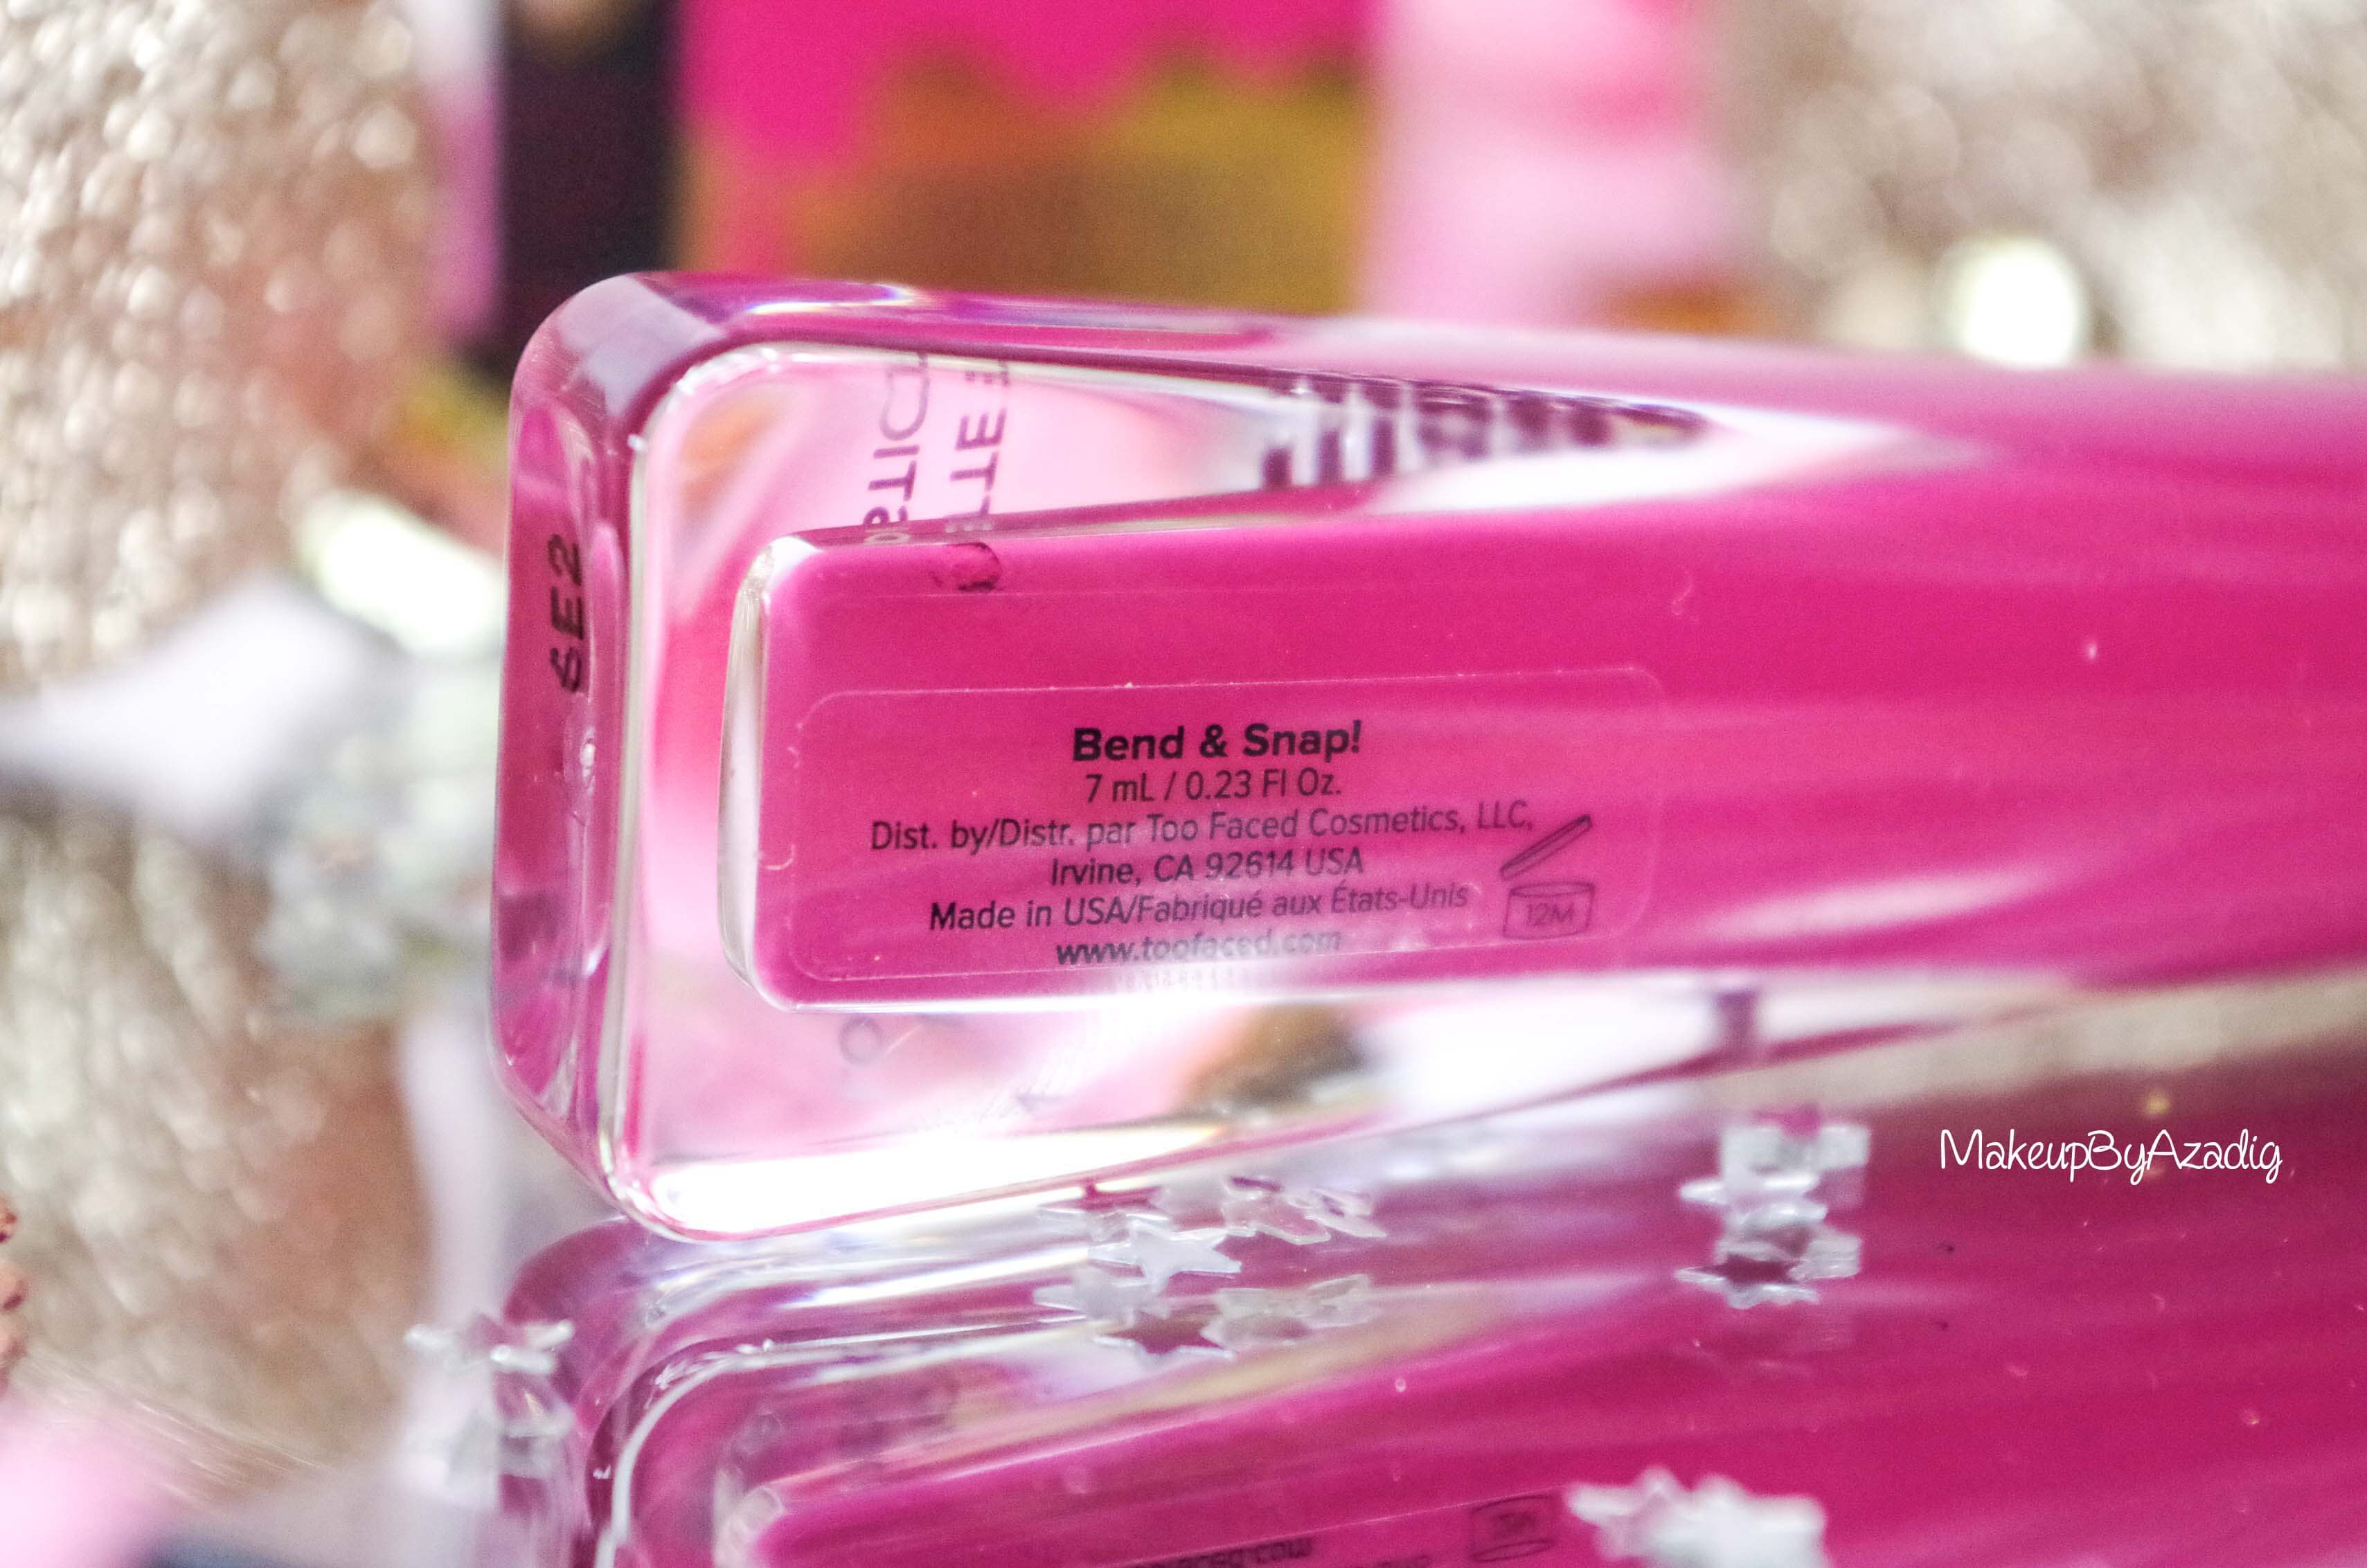 makeupbyazadig-melted-matte-queenb-bendandsnap-influencer-too-faced-rouge-levres-revue-avis-prix-sephora-paris-blog-liquide-nom